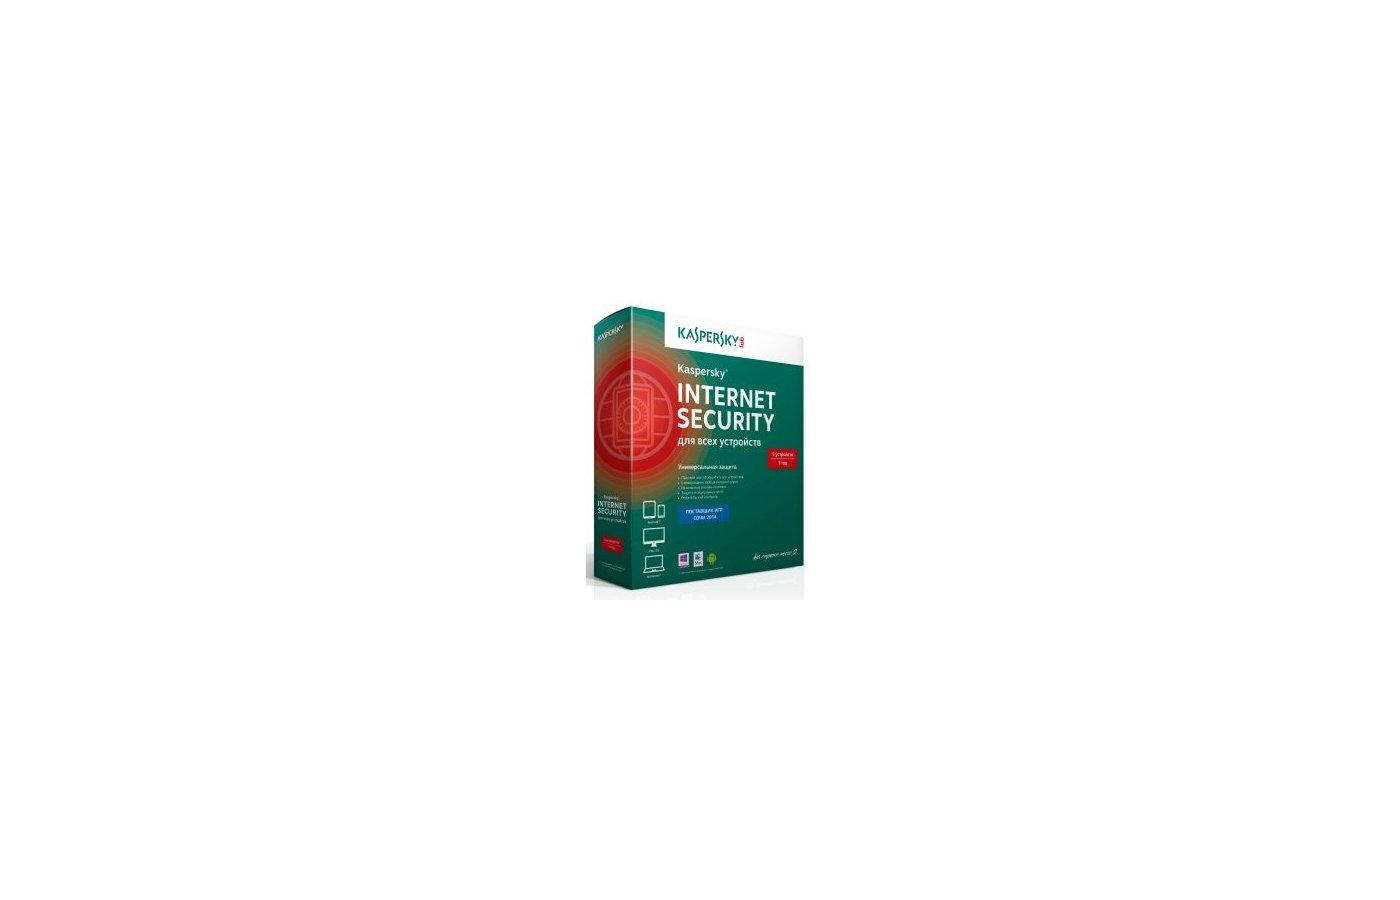 Компьютерное ПО Kaspersky Internet Security Multi-Device Russian Ed. 5-Device 1 year Base Box (KL1941RBEFS)